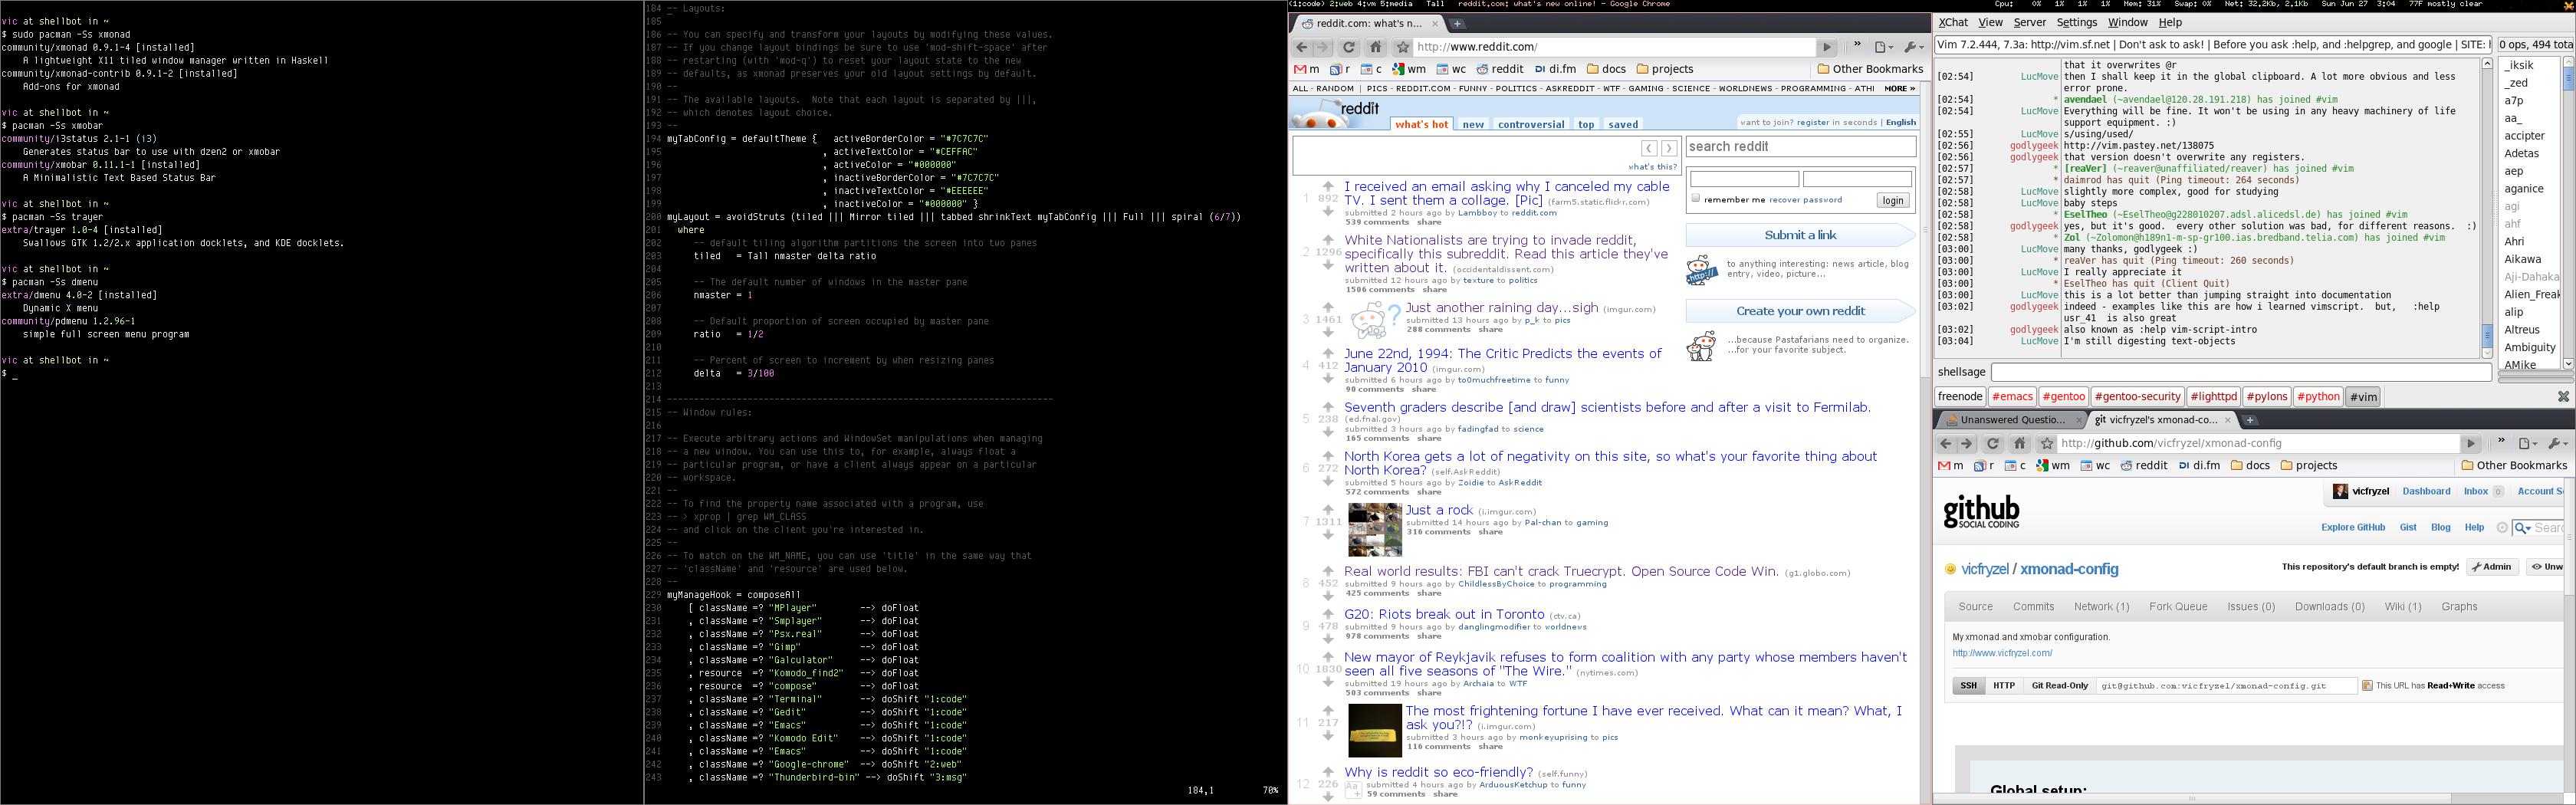 Screenshot of xmonad-config